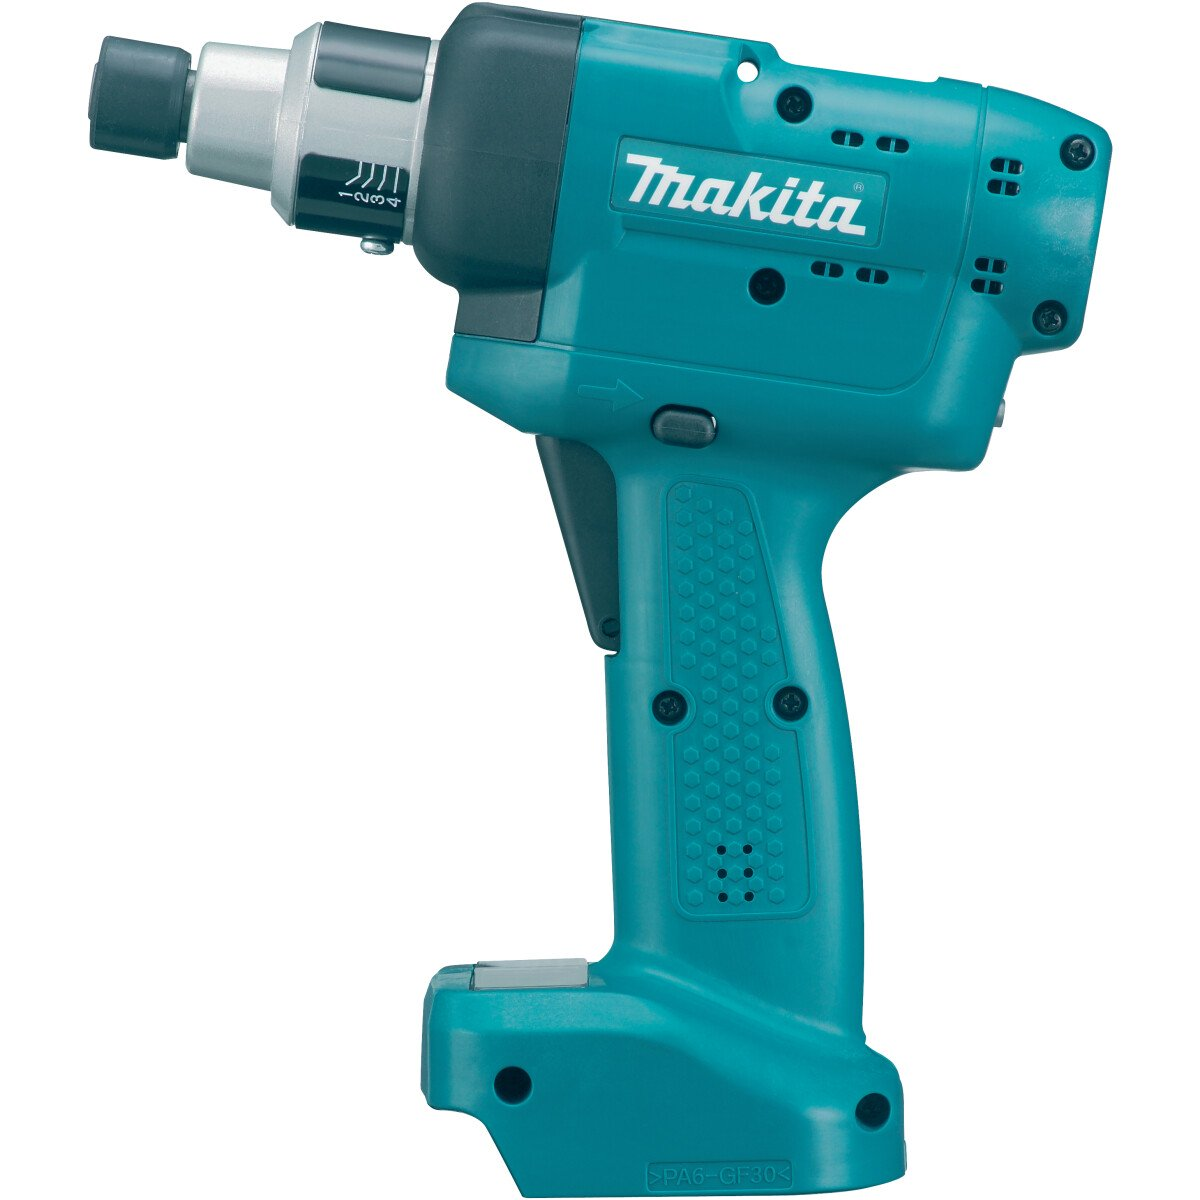 Makita BFT041FZ Body Only 14.4v Screwdriver